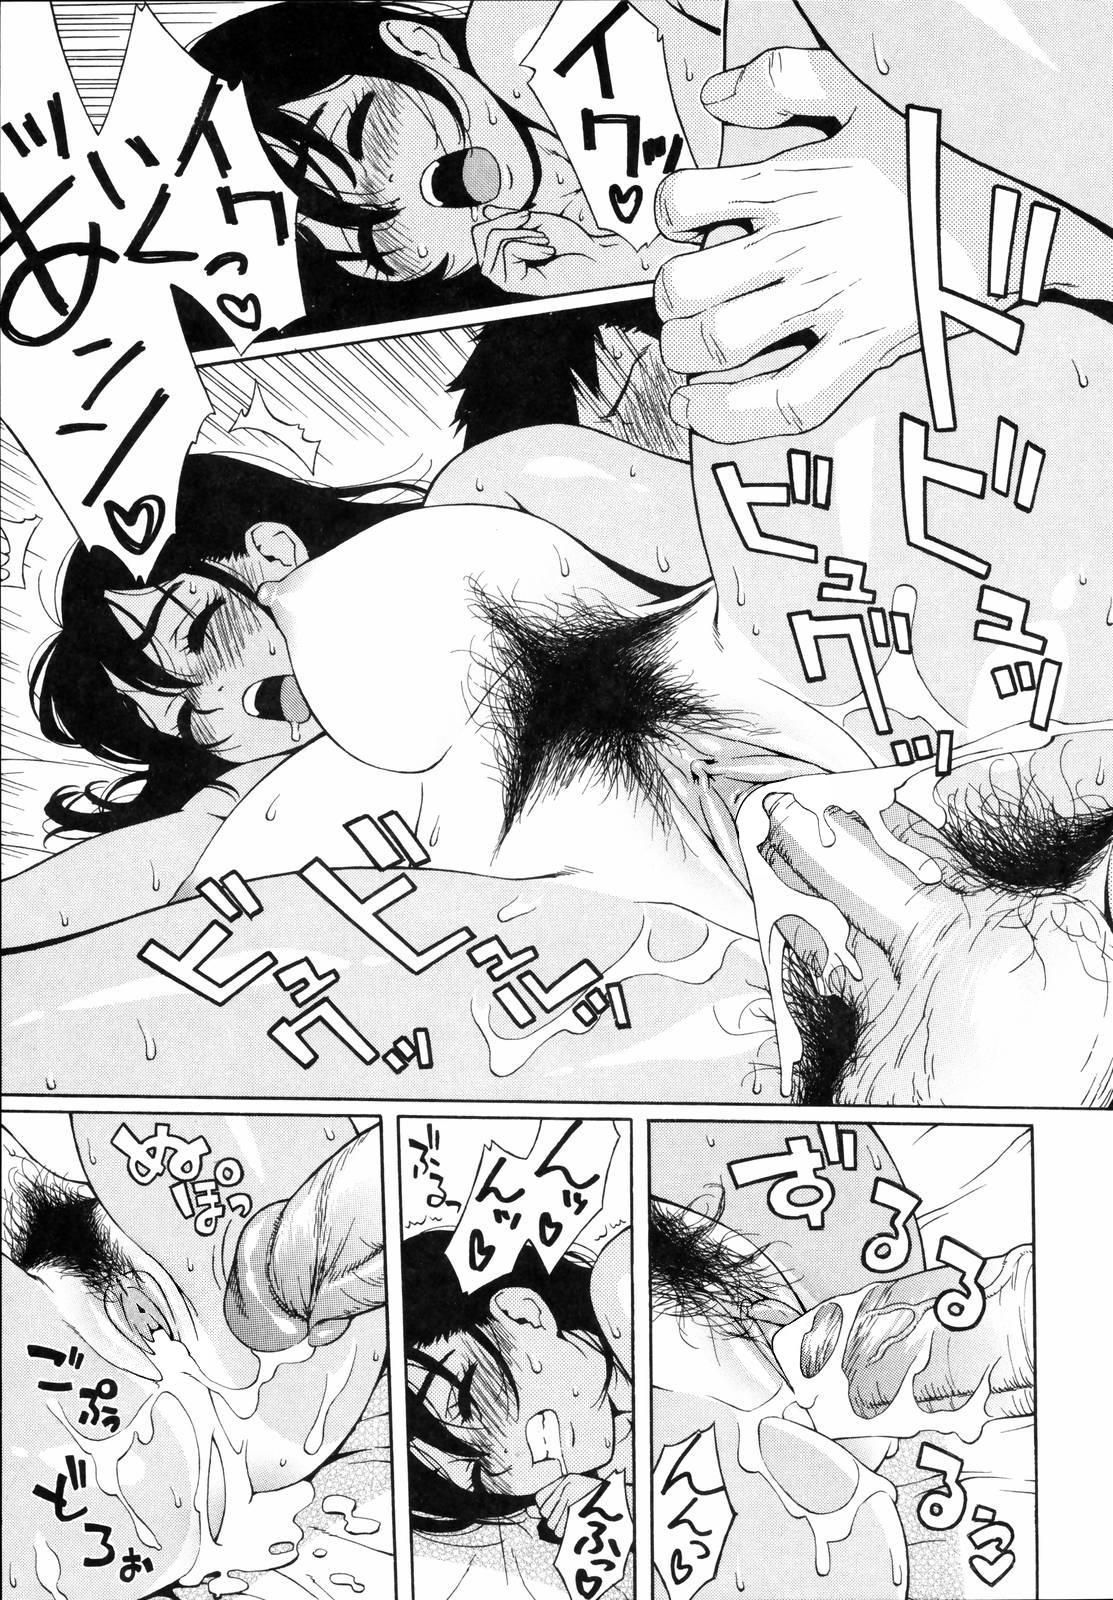 Shishunki wa Hatsujouki - Adolescence is a sexual excitement period. 178